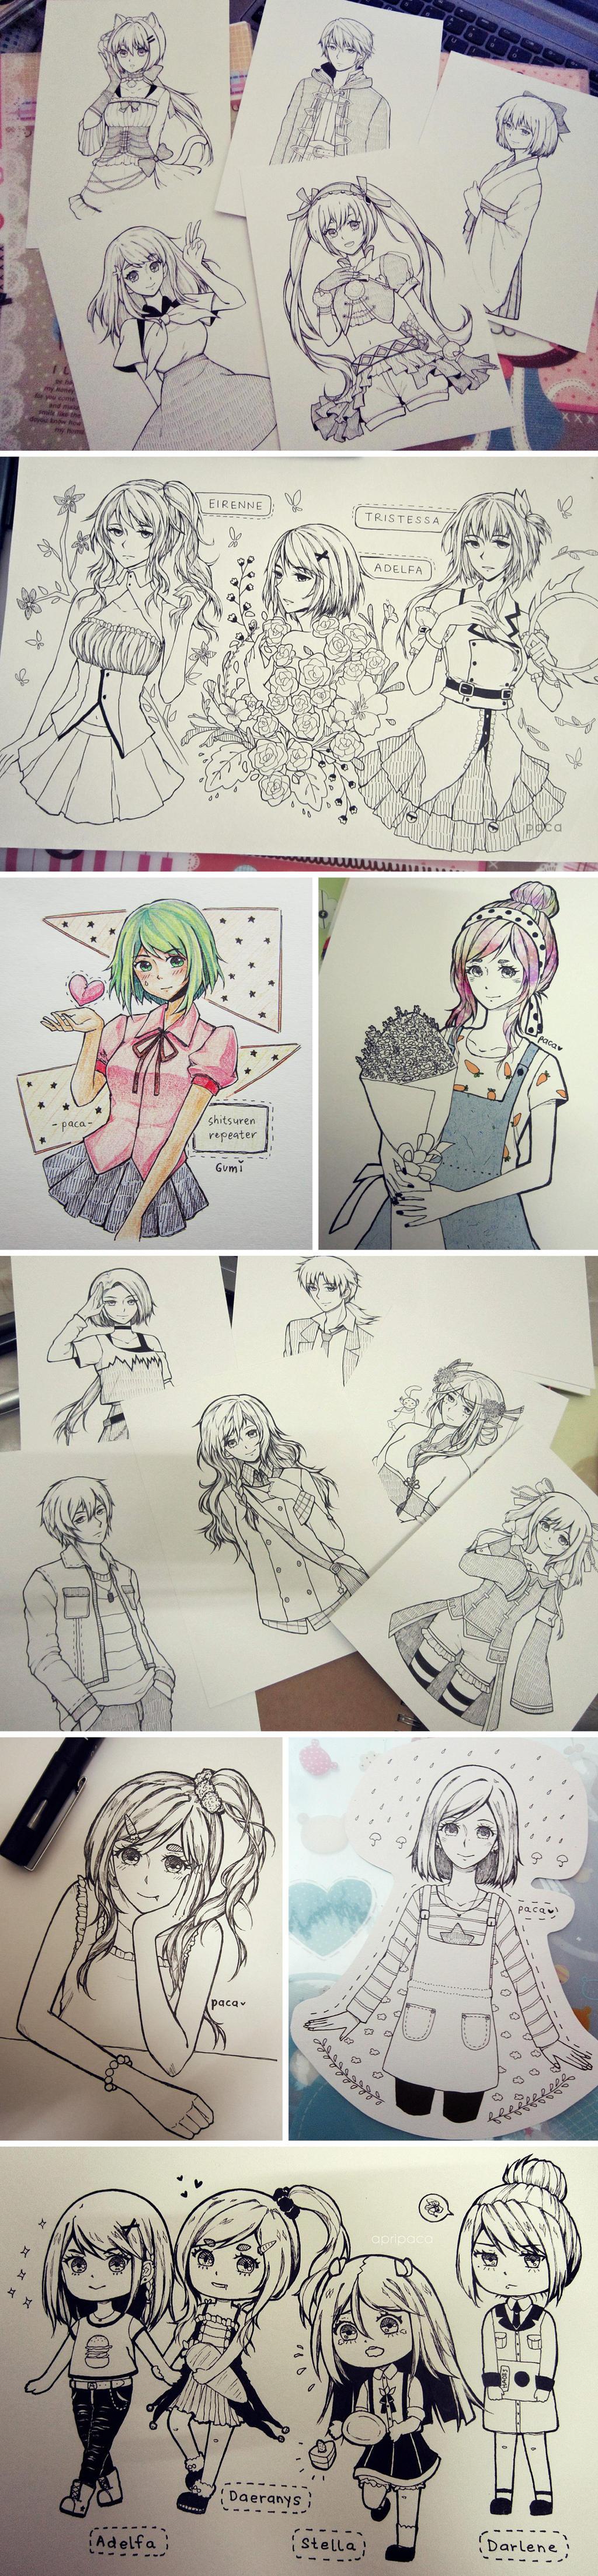 Art Dump 02 by izuriwa